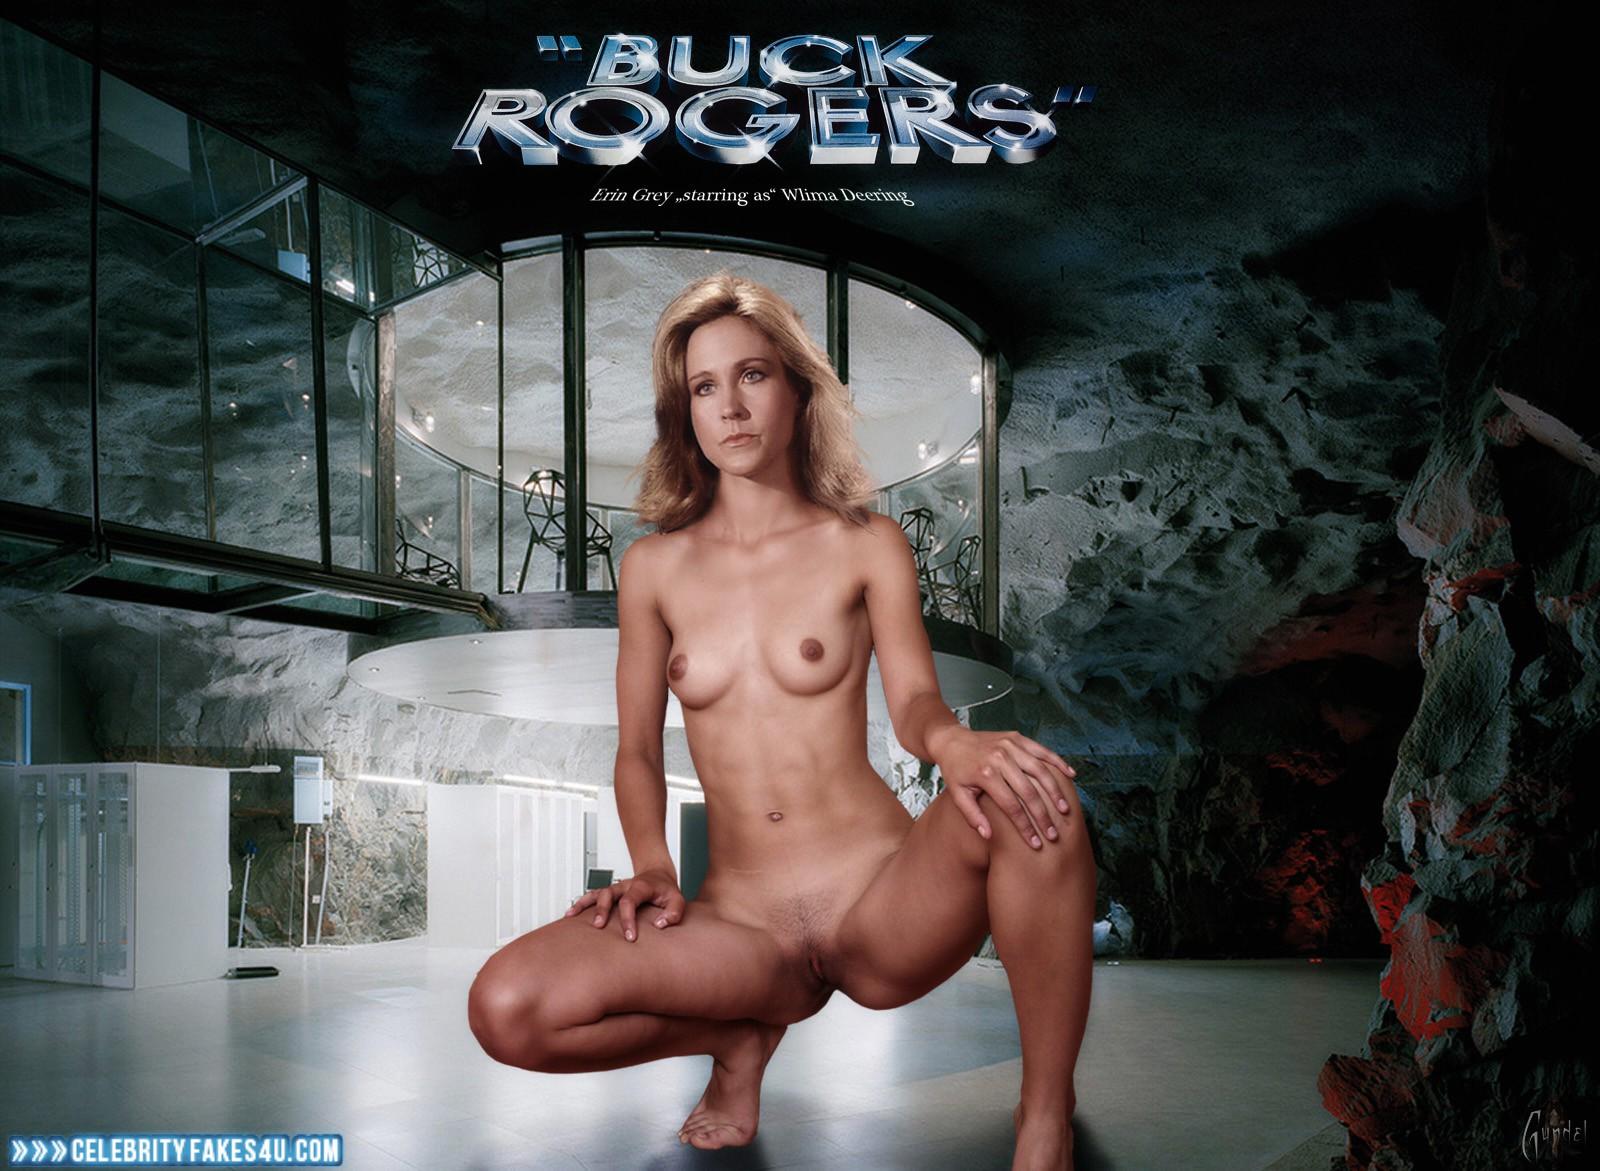 Buck rogers porn